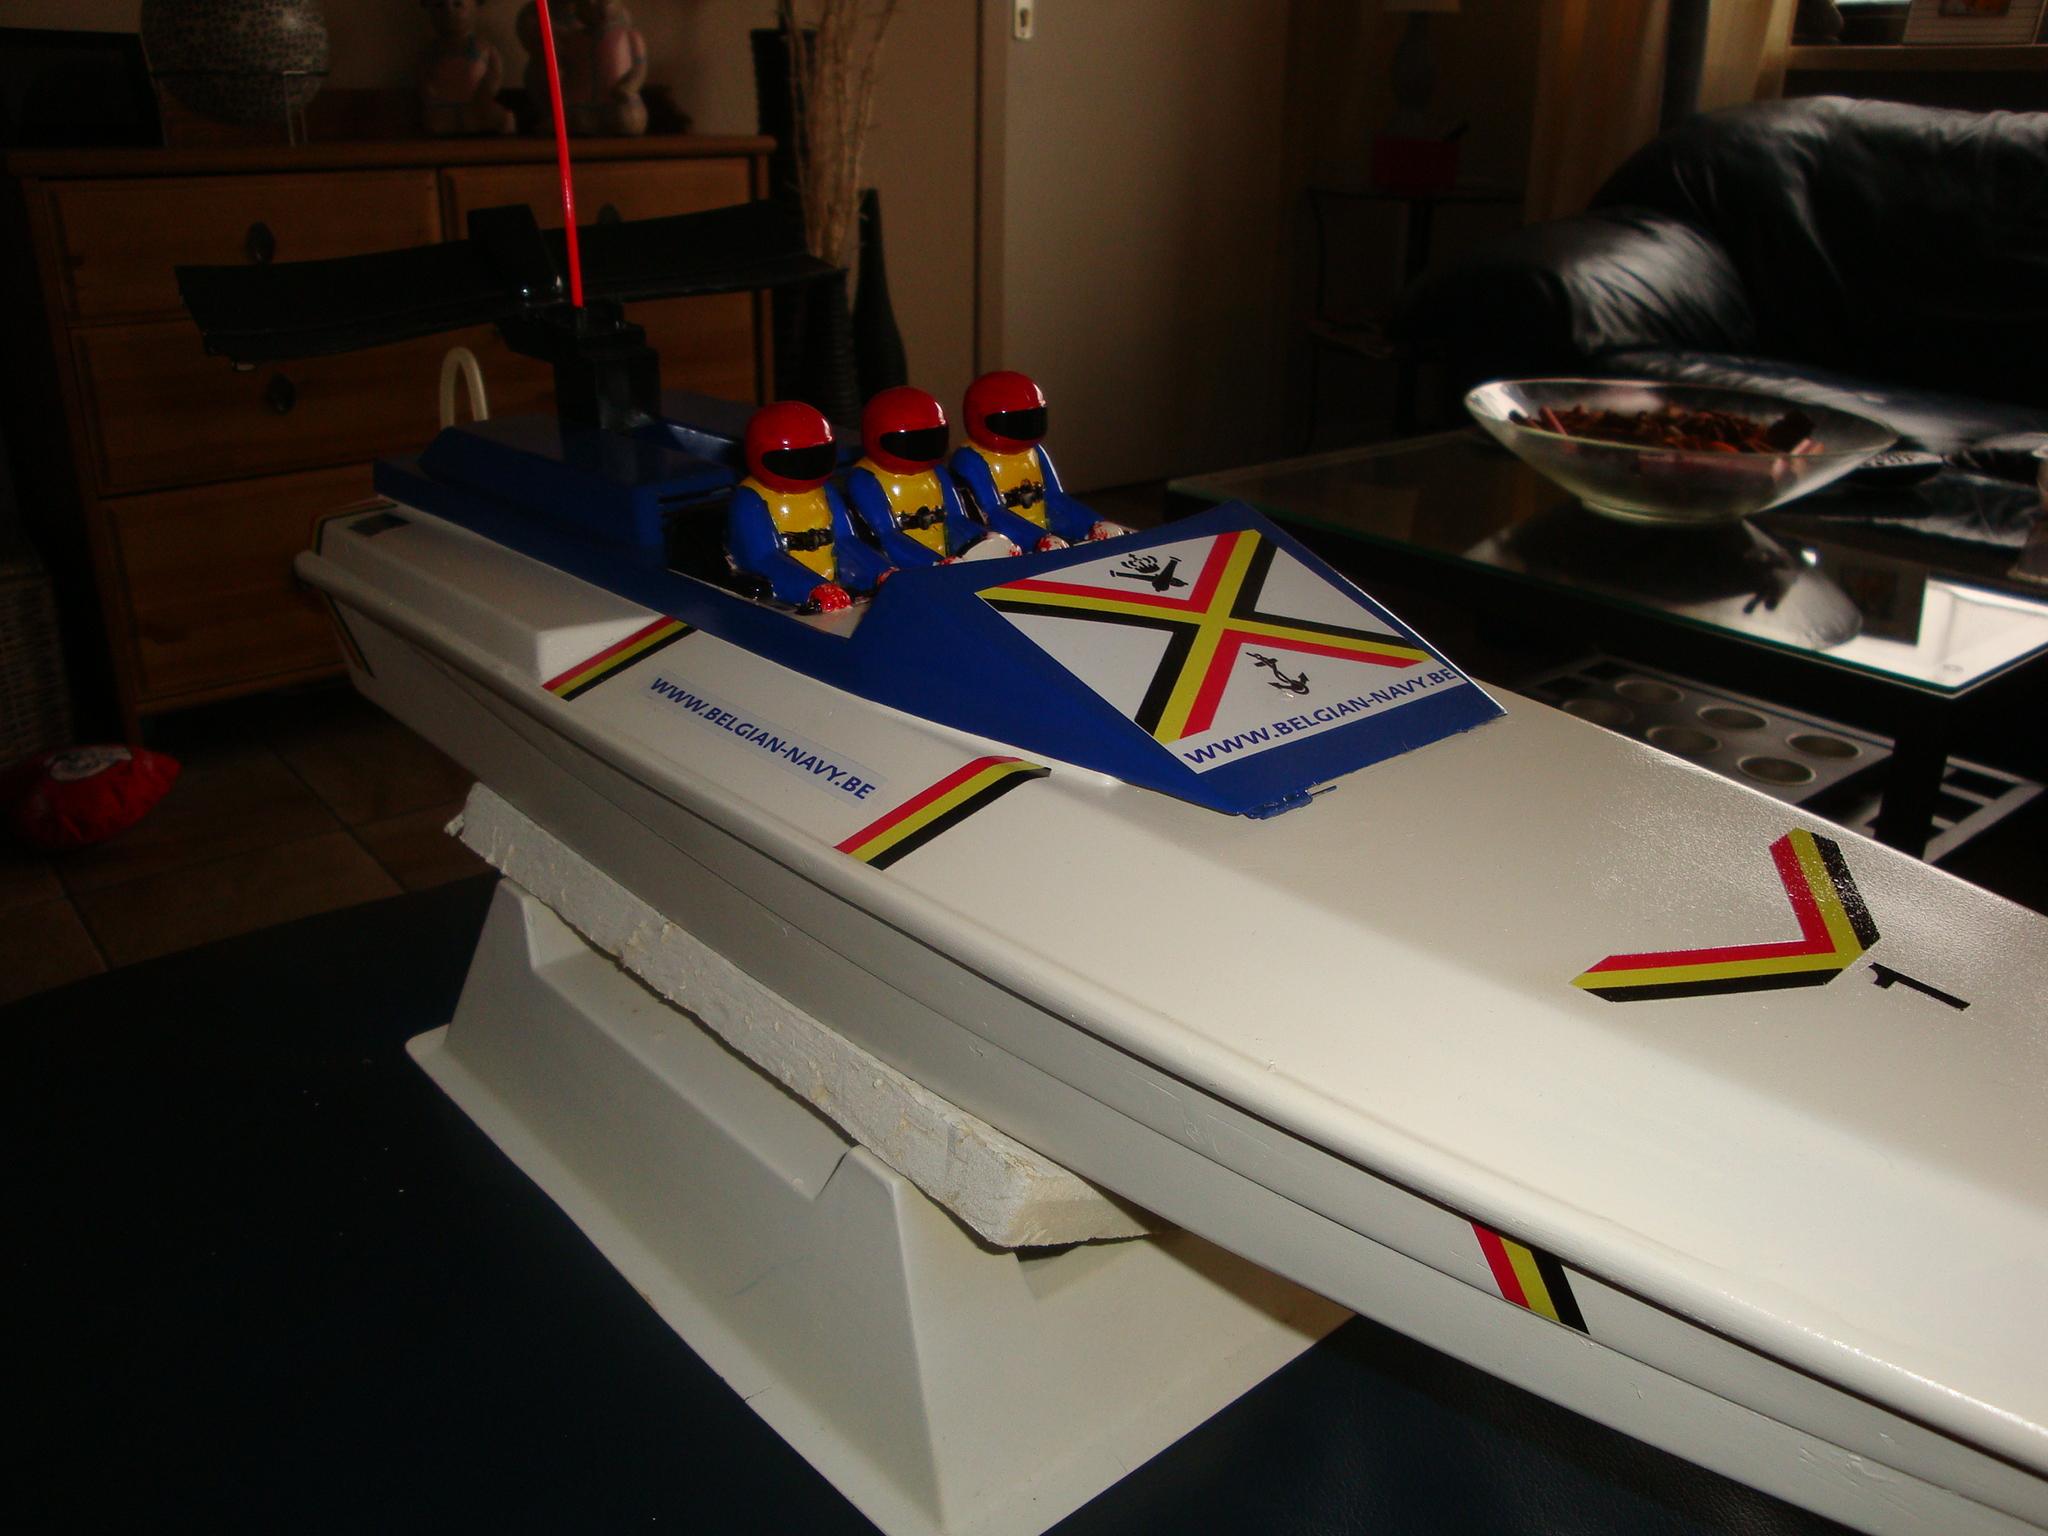 La flotte de NAVYCOOL - Page 3 100223110407990285500549